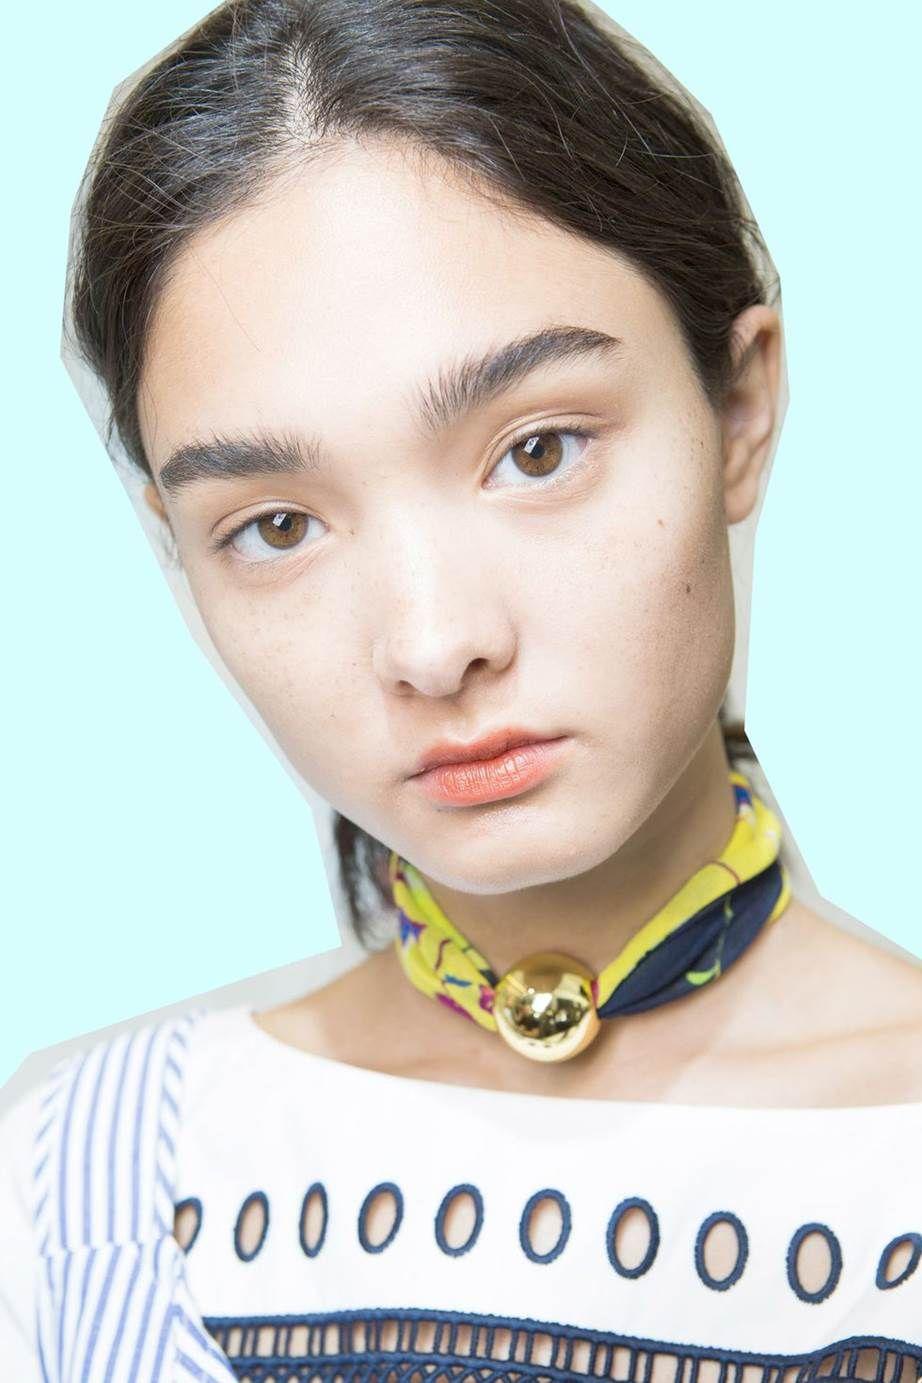 Makeup hacks for natural looking foundation, blush & lips